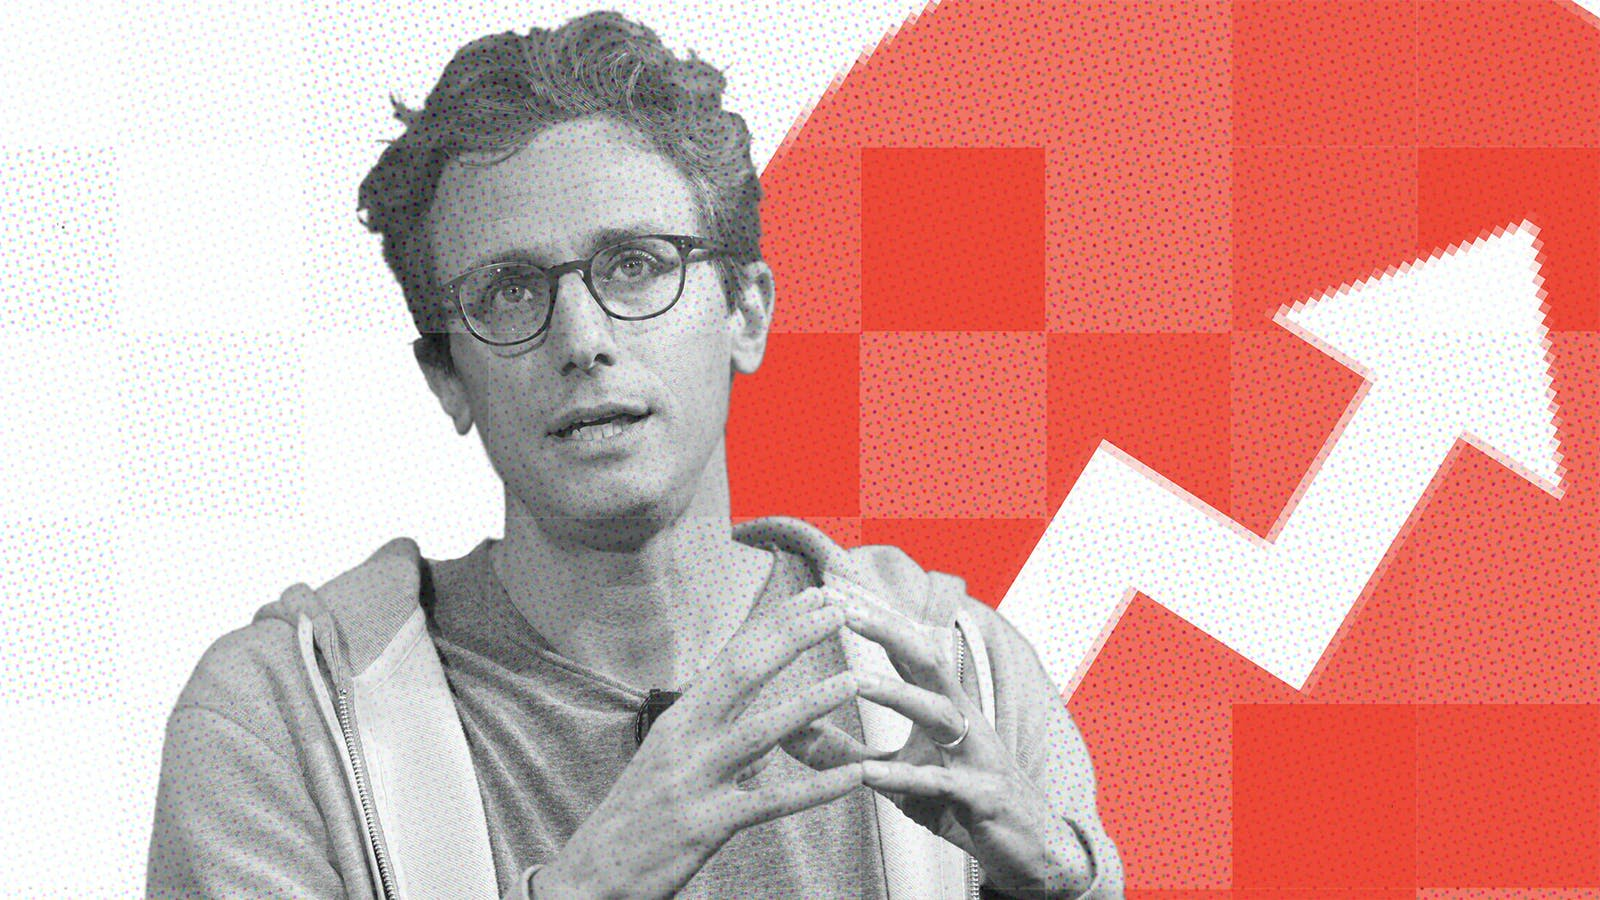 BuzzFeed CEO Jonah Peretti. Art by Mike Sullivan